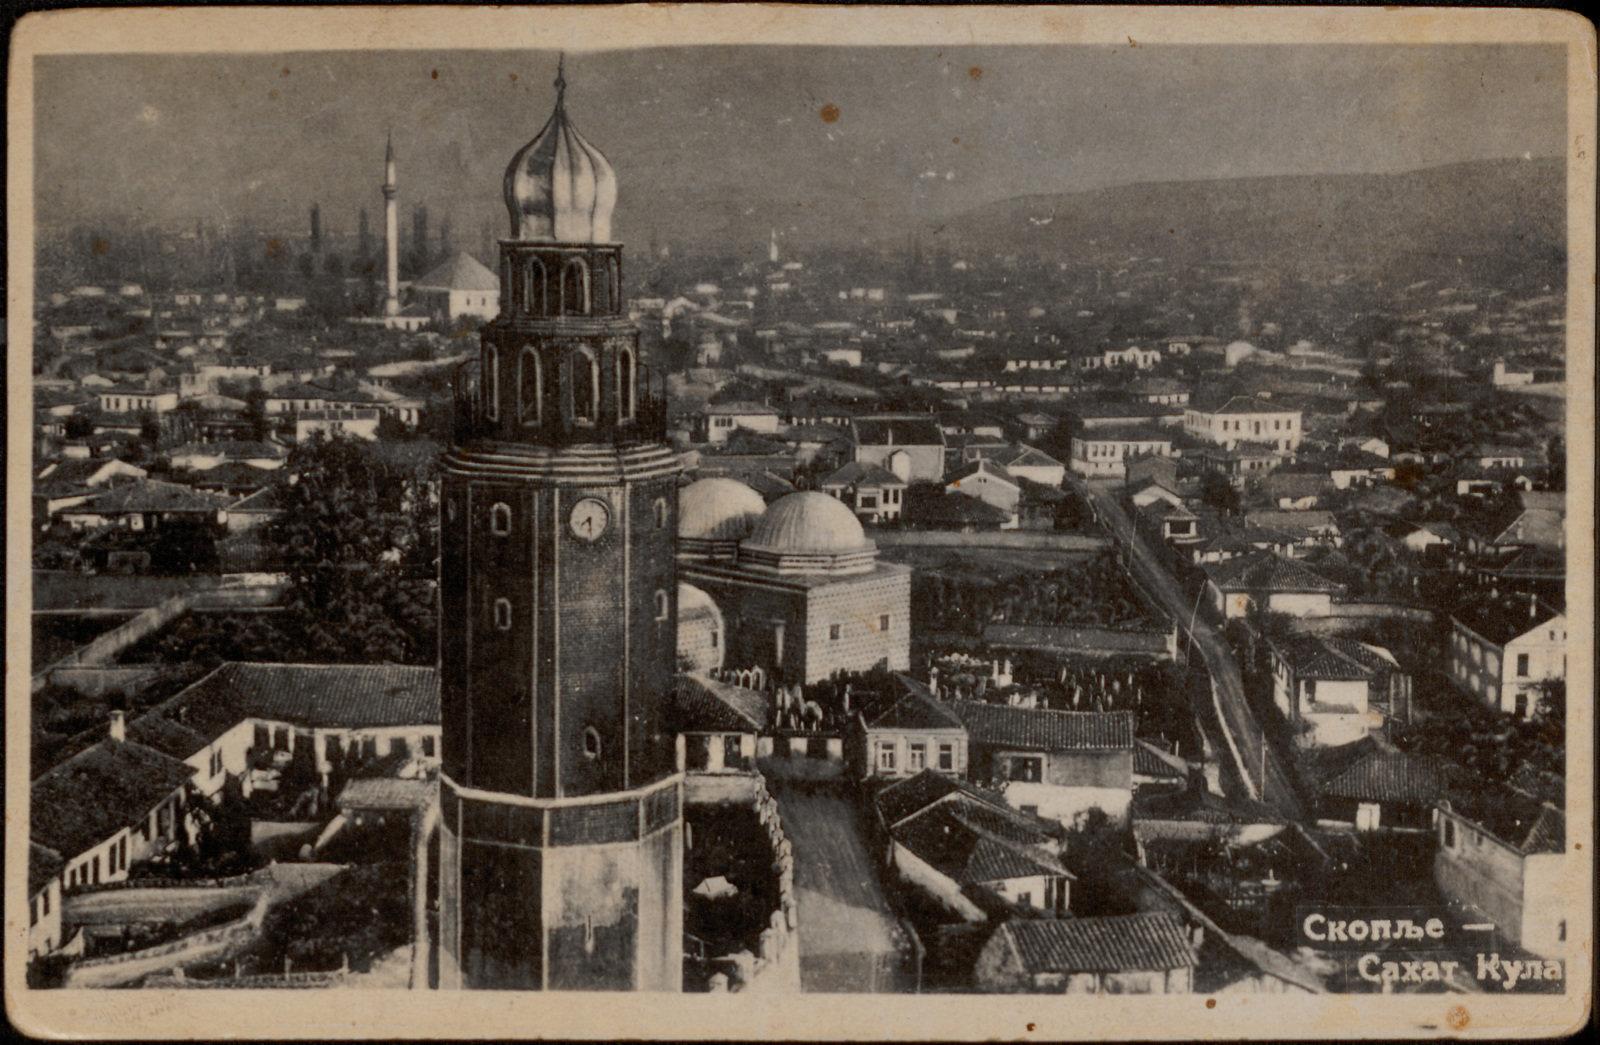 The Clock Tower, Skopje, 1927, Trafika Vasa Stojanović, National and University Library, Skopje, CC BY-NC-ND